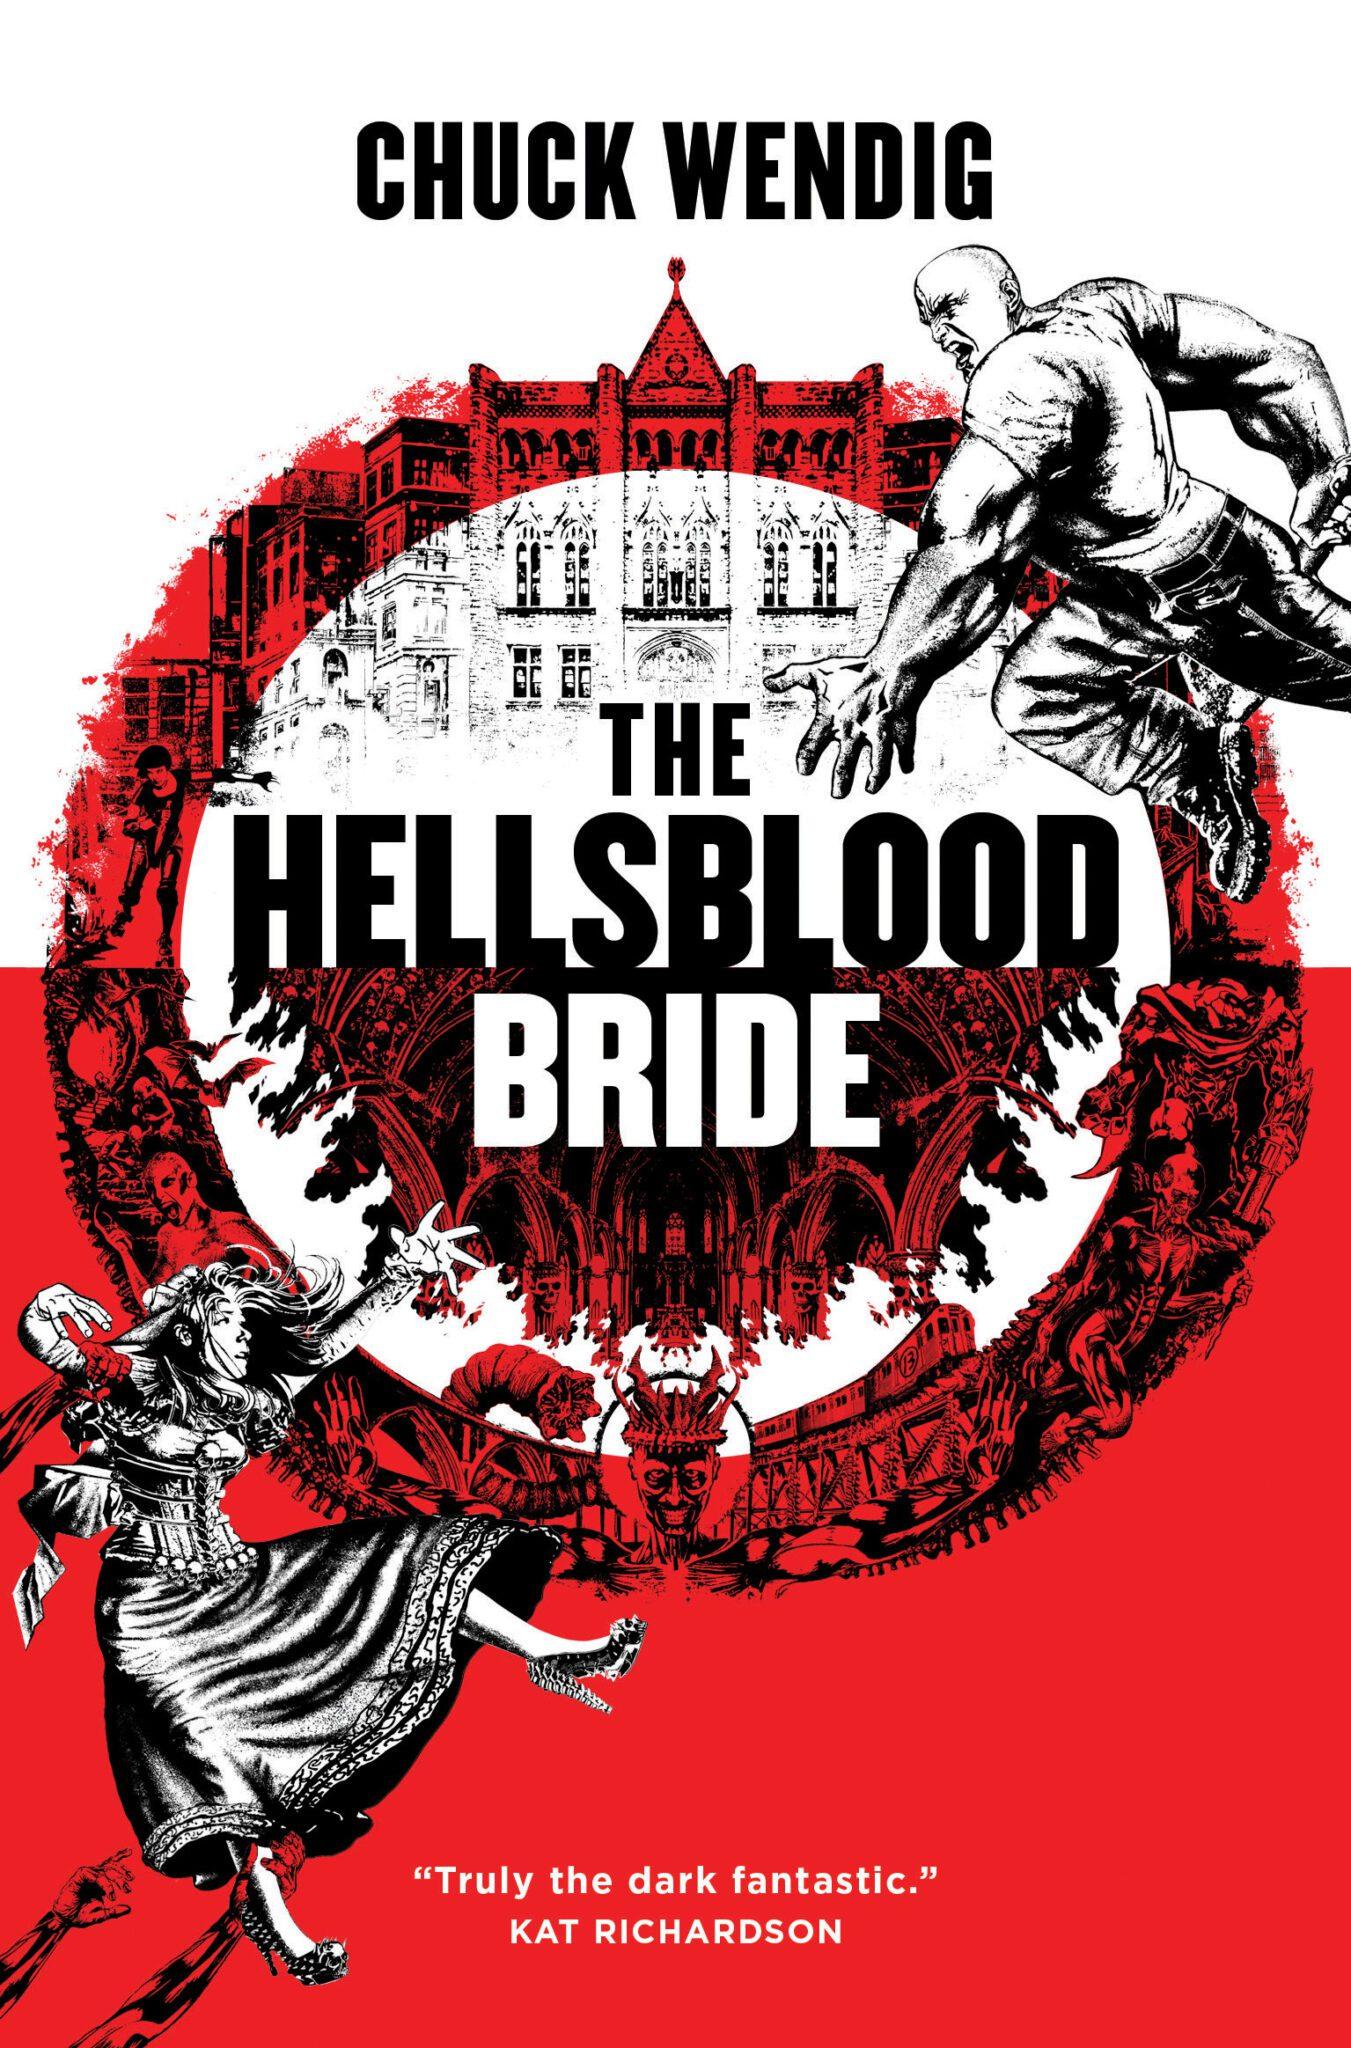 TheHellsbloodBride-300dpi_rpg